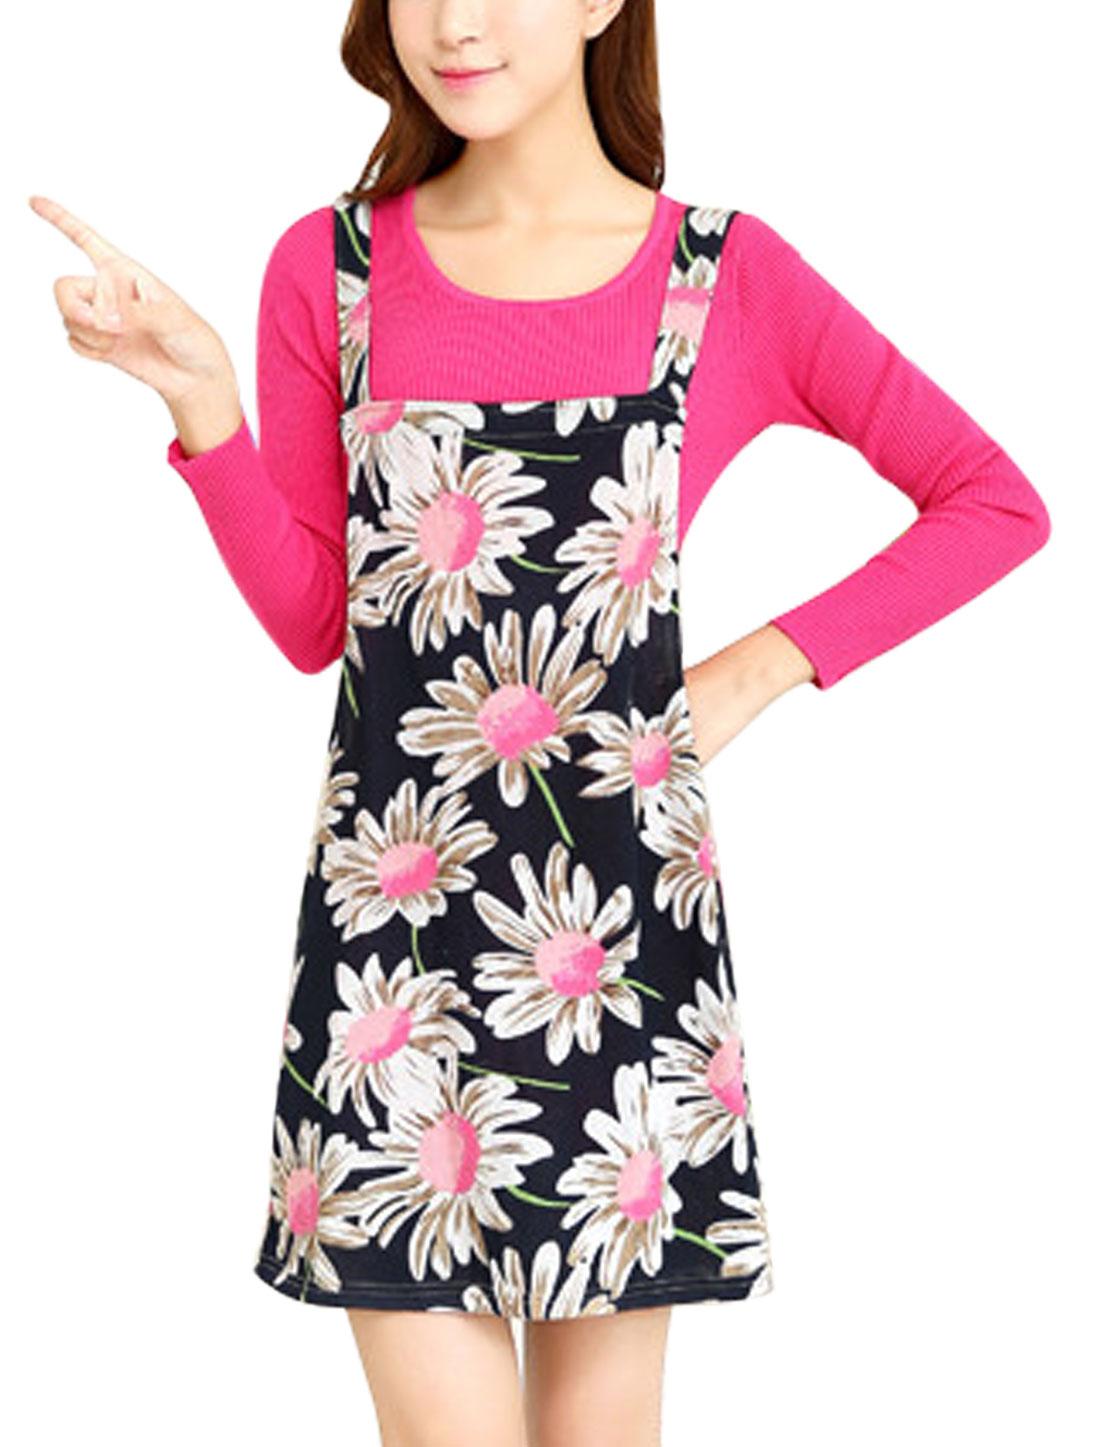 Women Floral Prints Straight Korean Style Suspender Knit Dress Navy Blue M